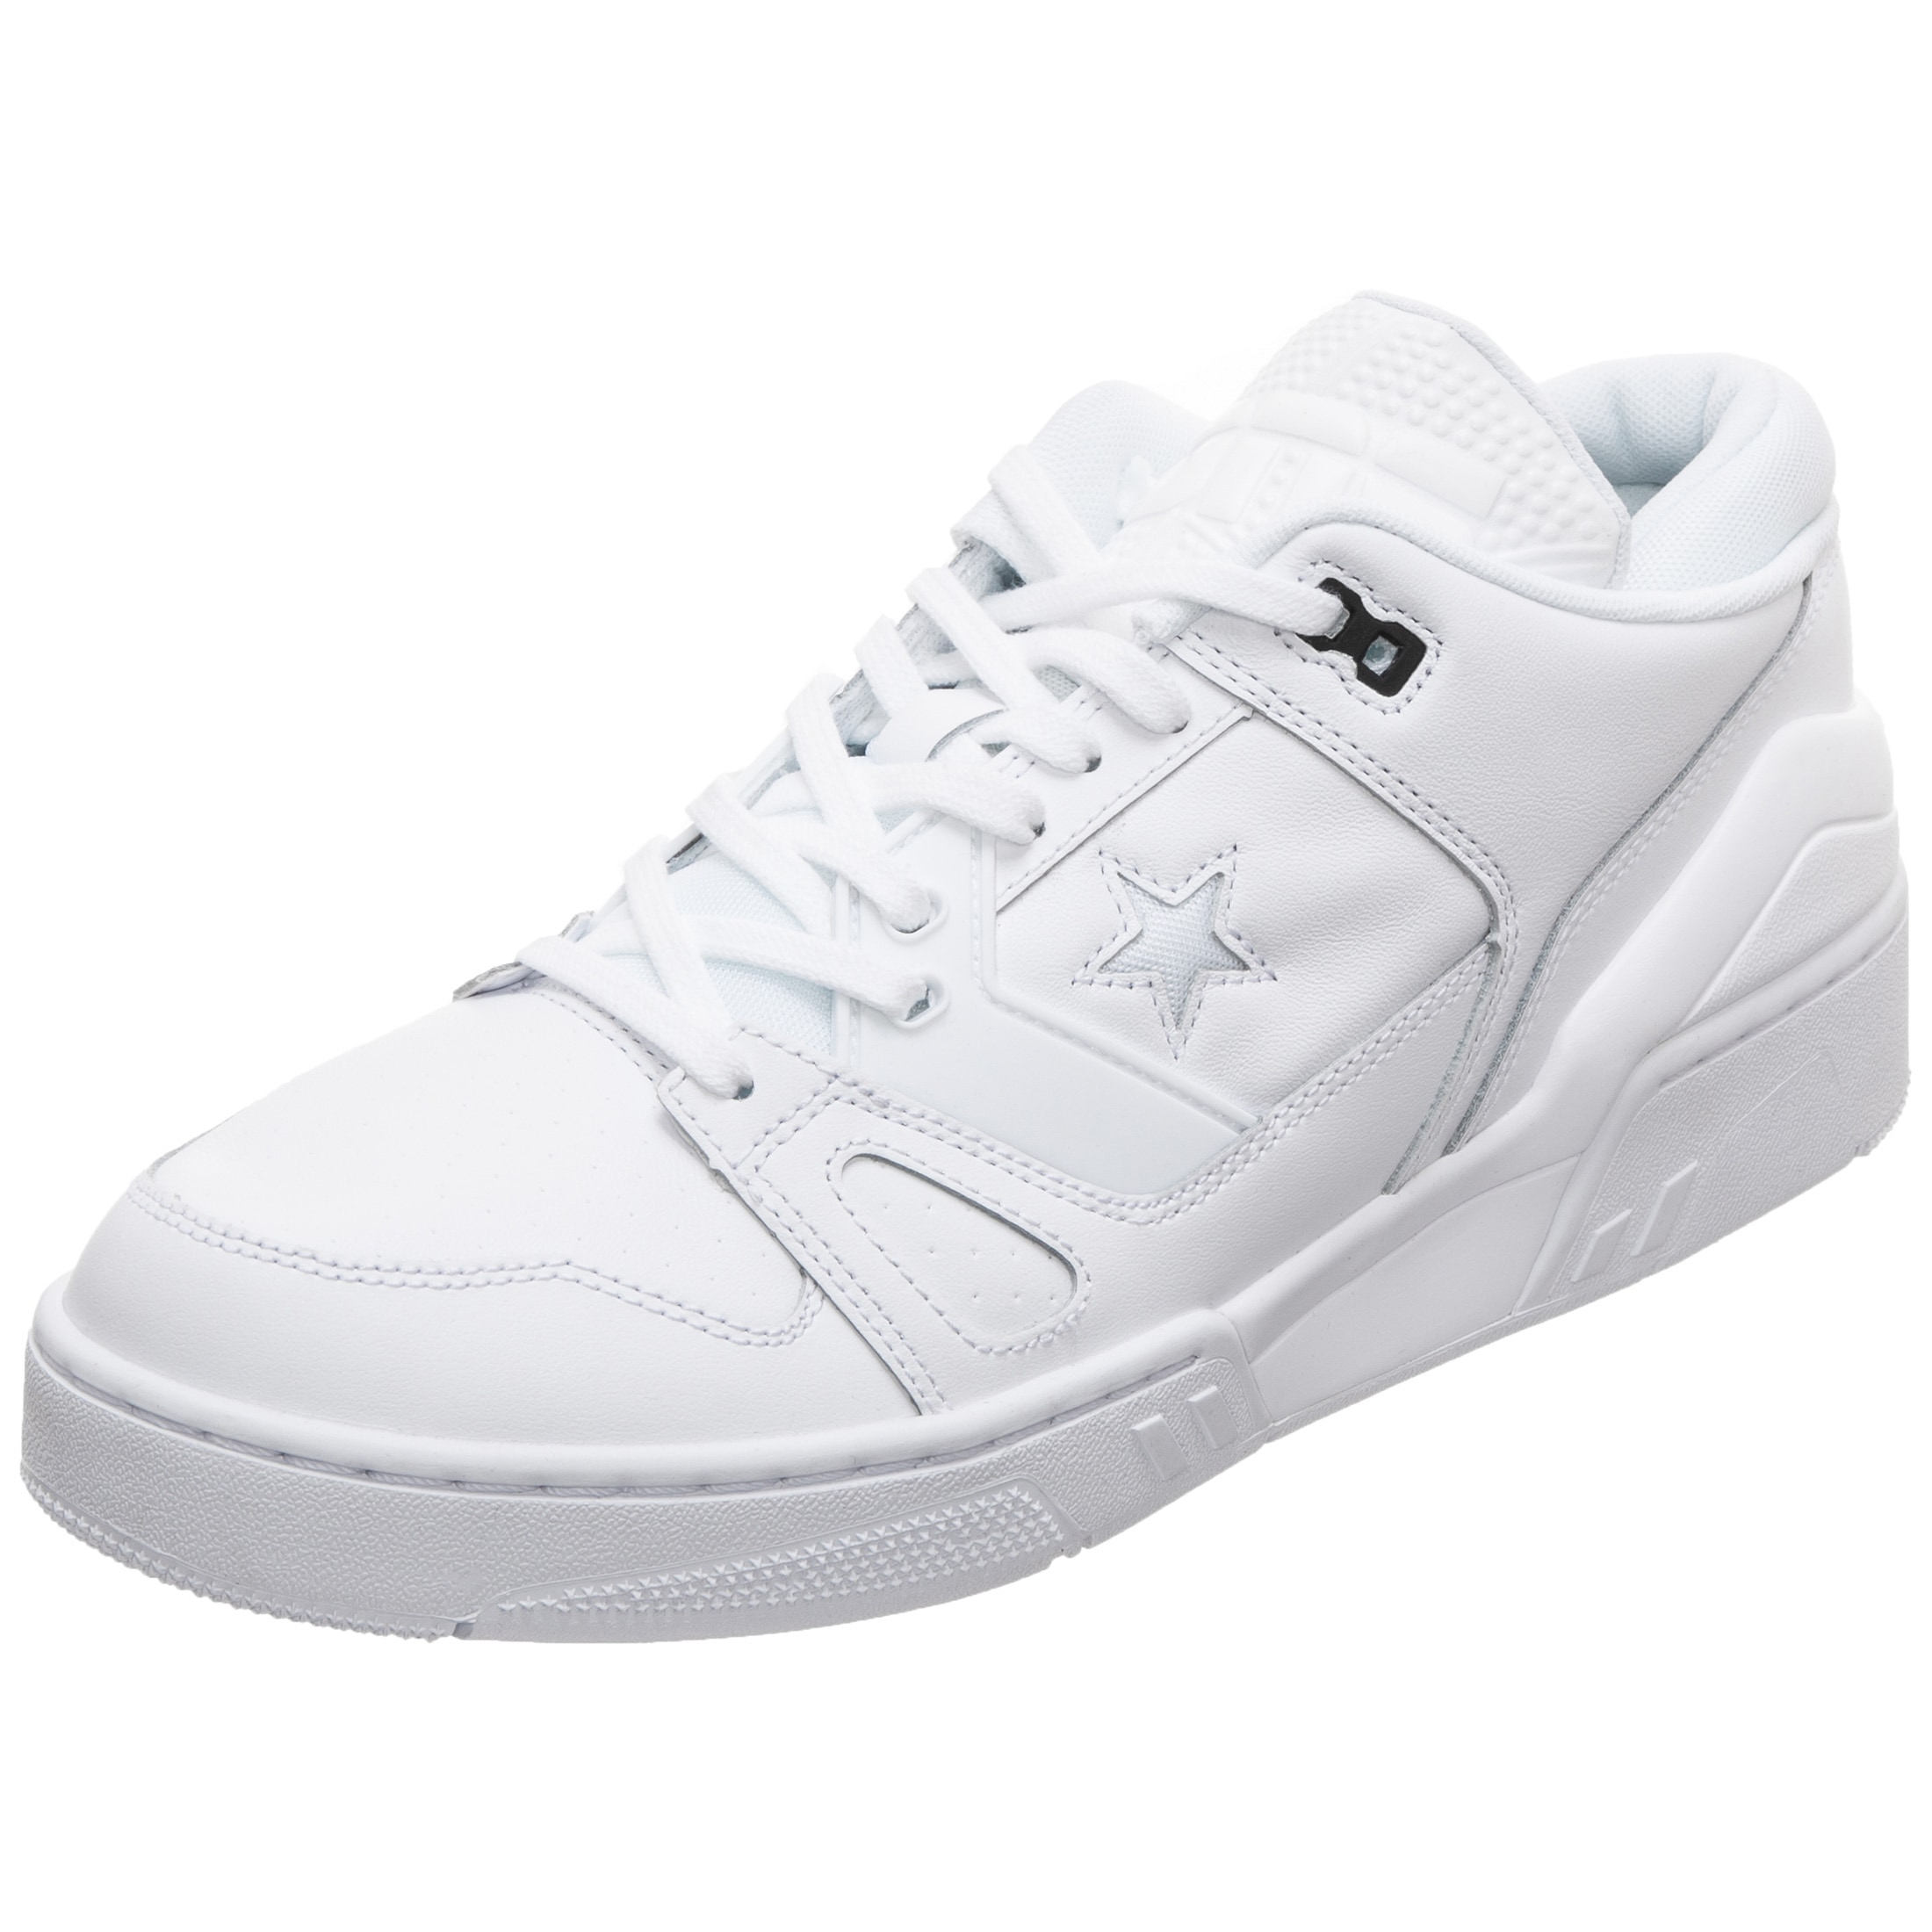 Converse Sneaker Erx 260 Mid